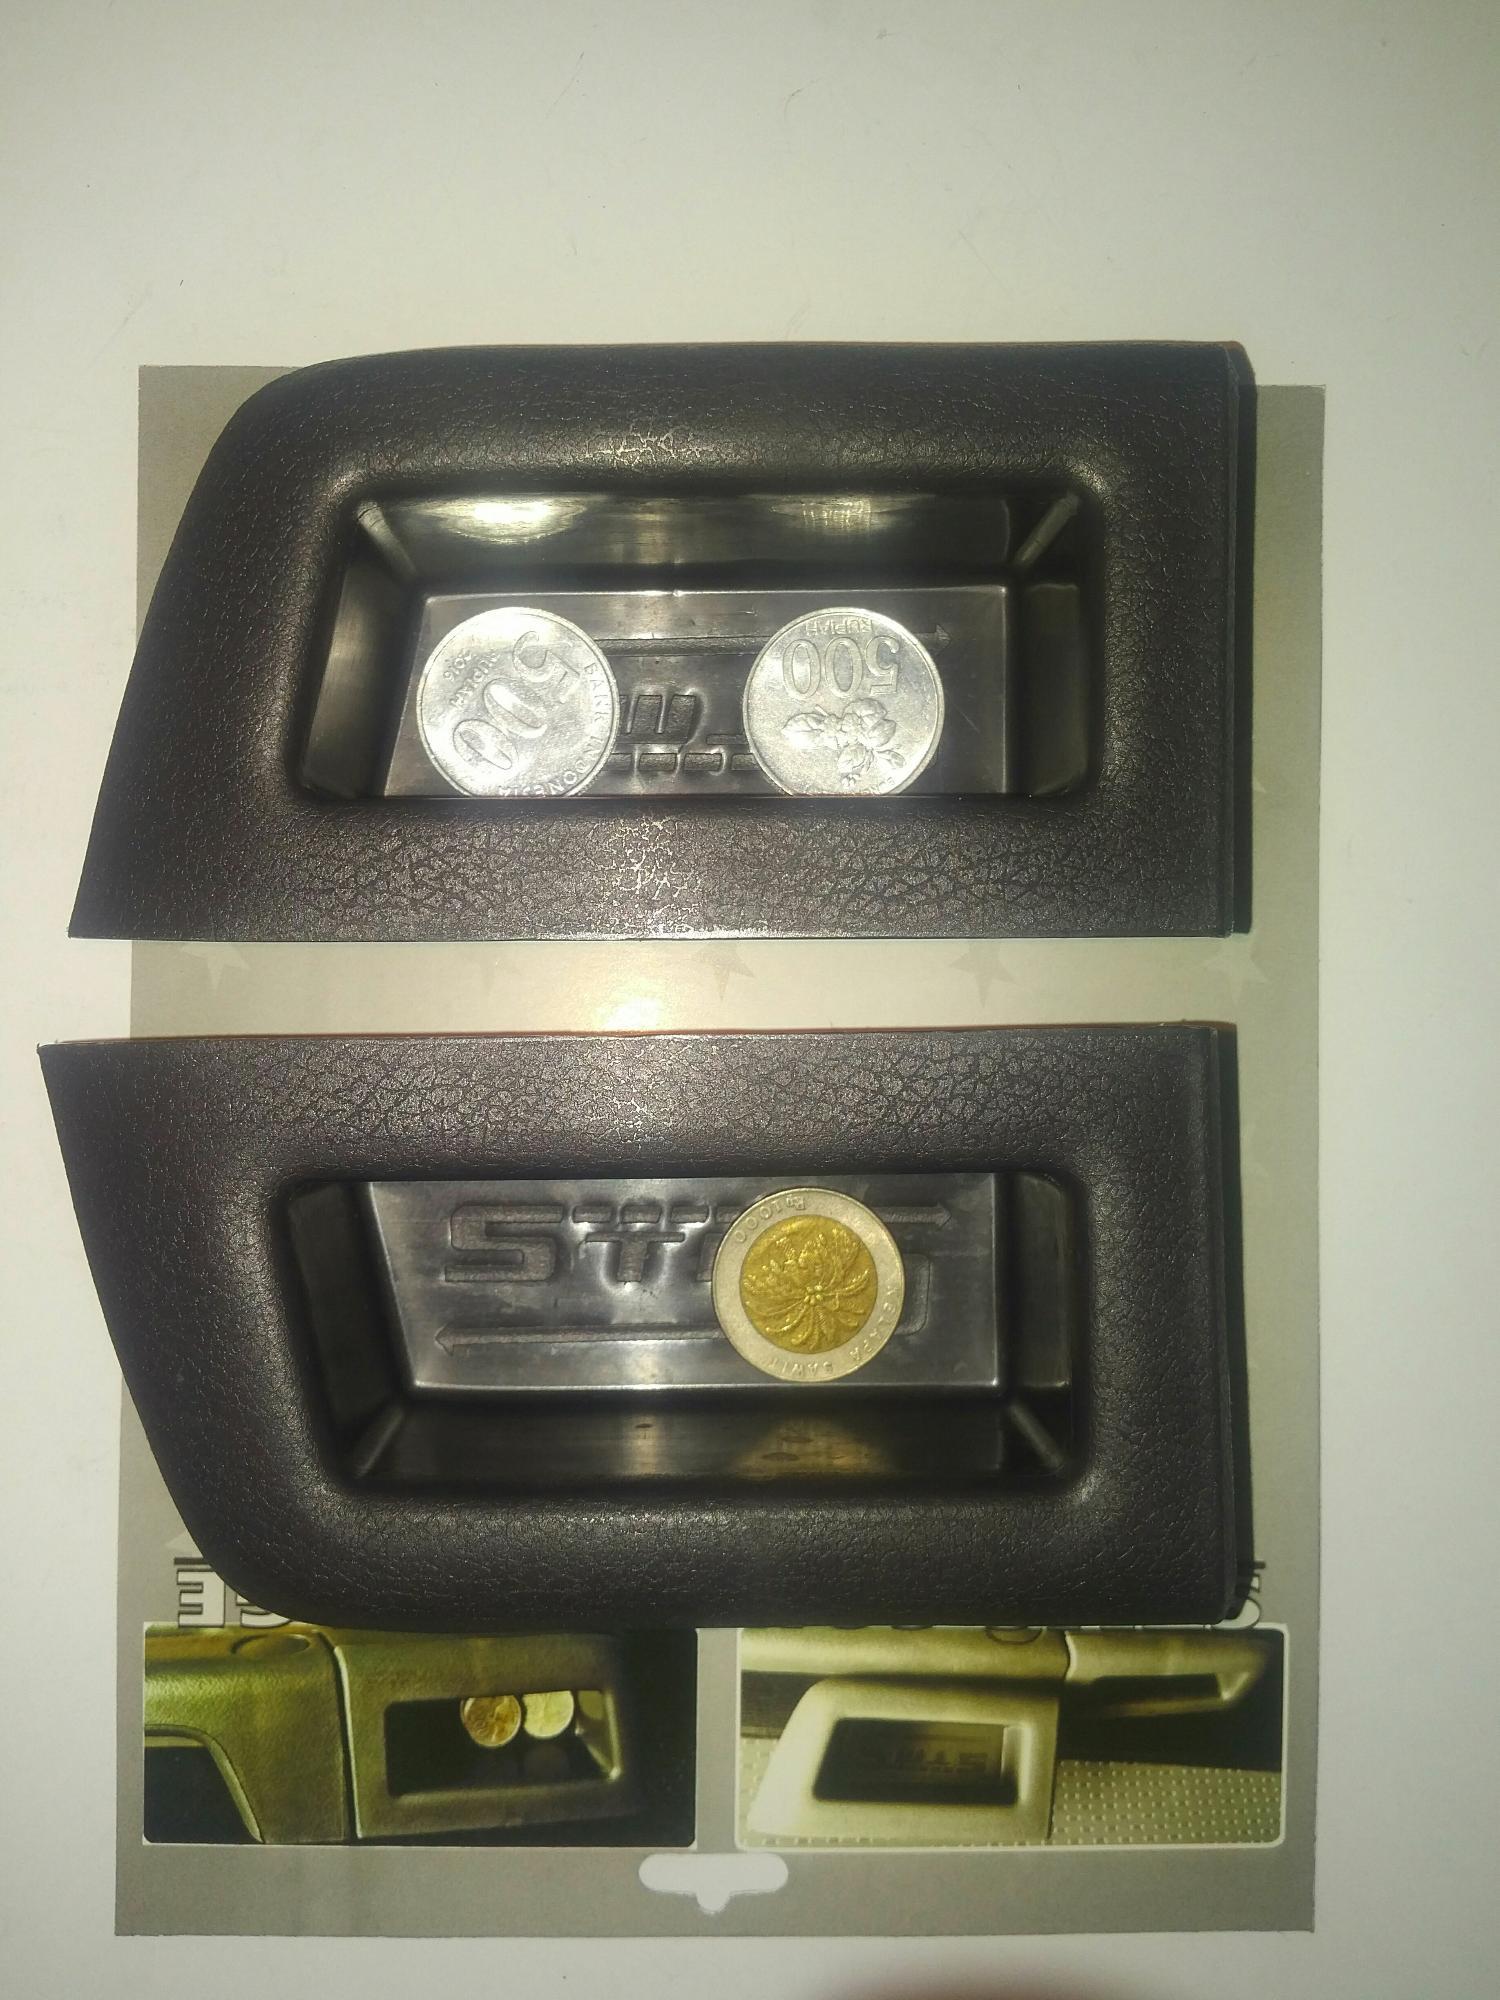 Coin/candy storage grand max minibus